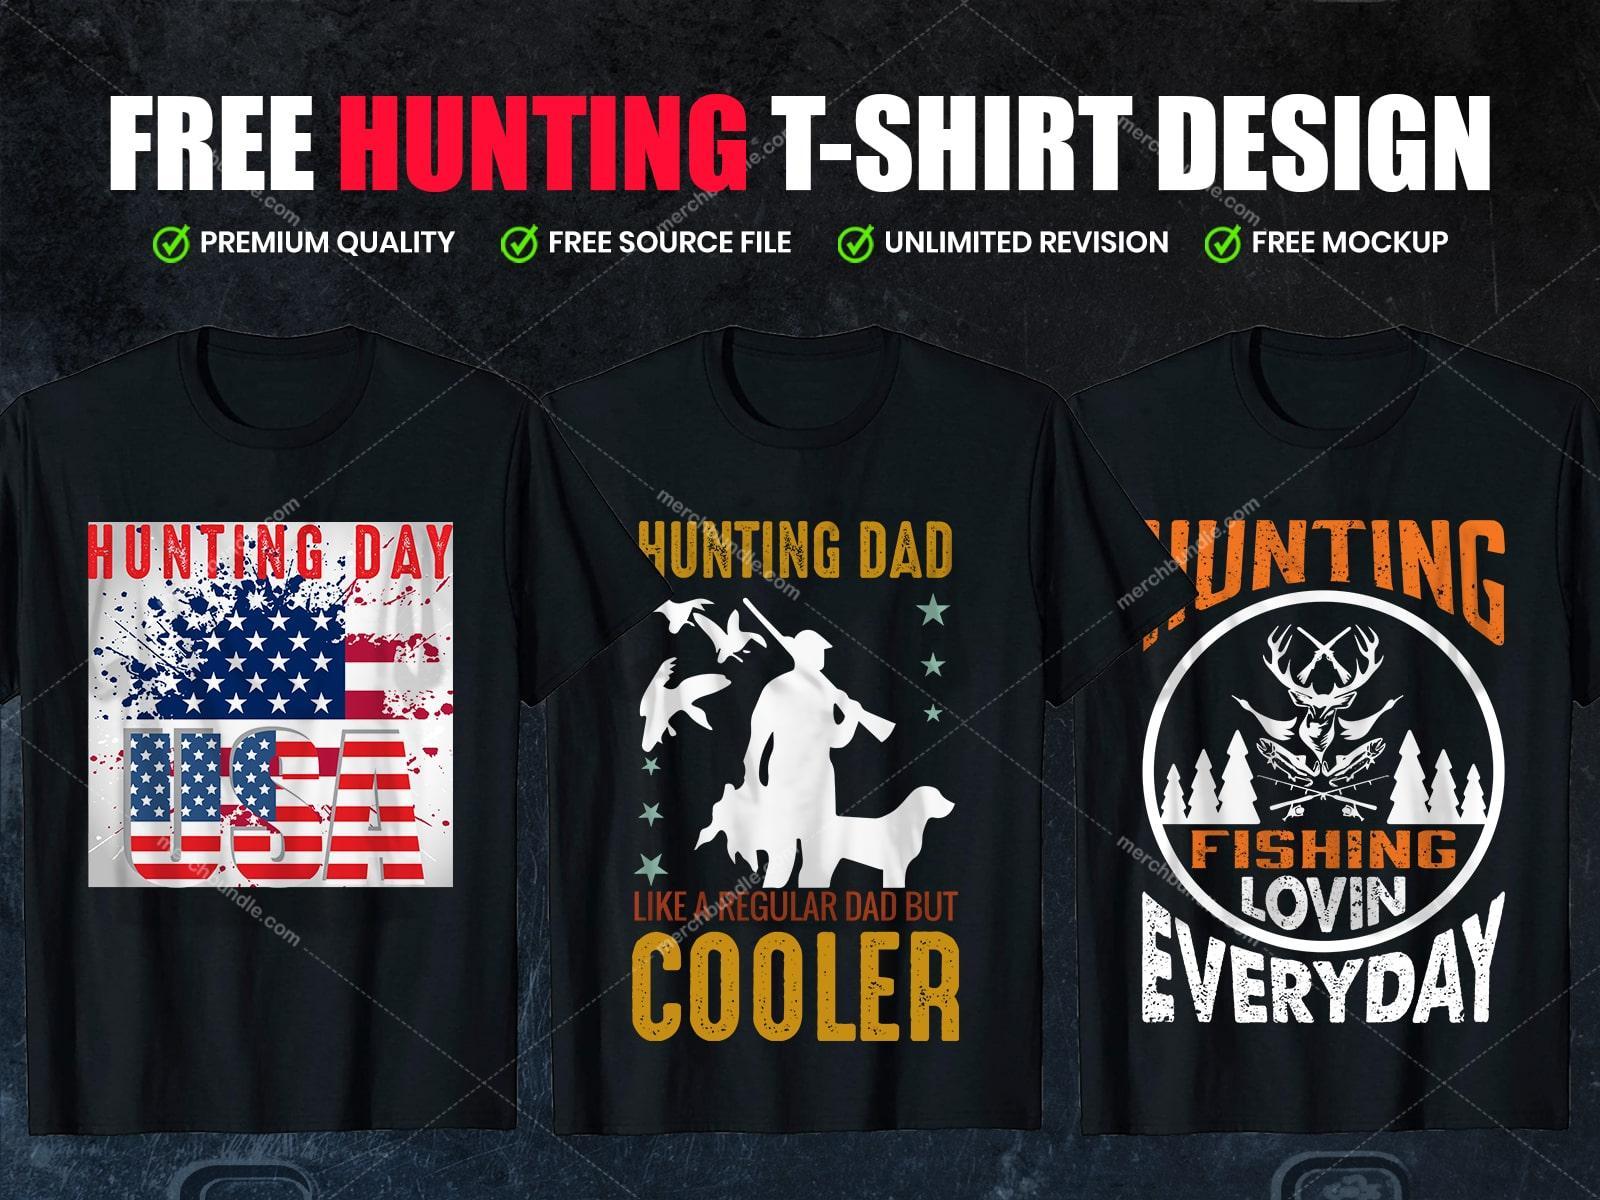 Free hunting t shirt design1